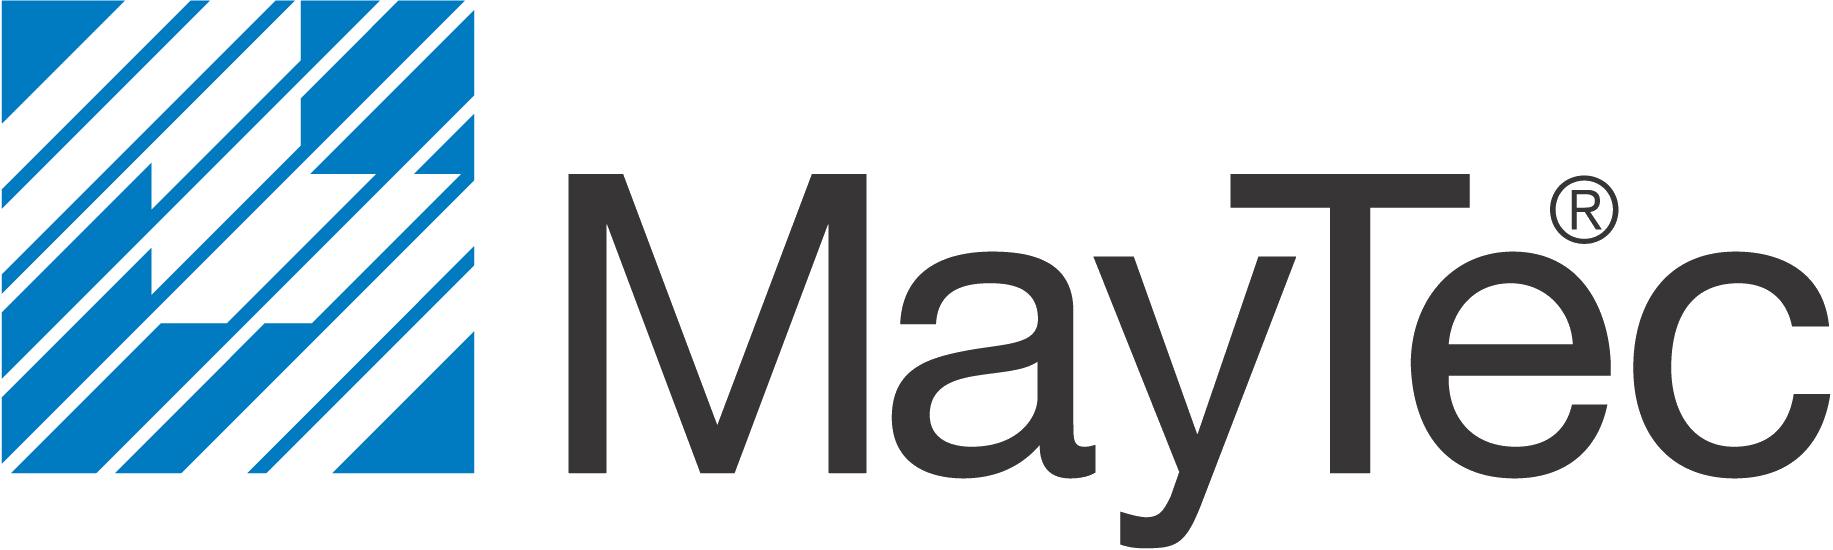 Maytec USA